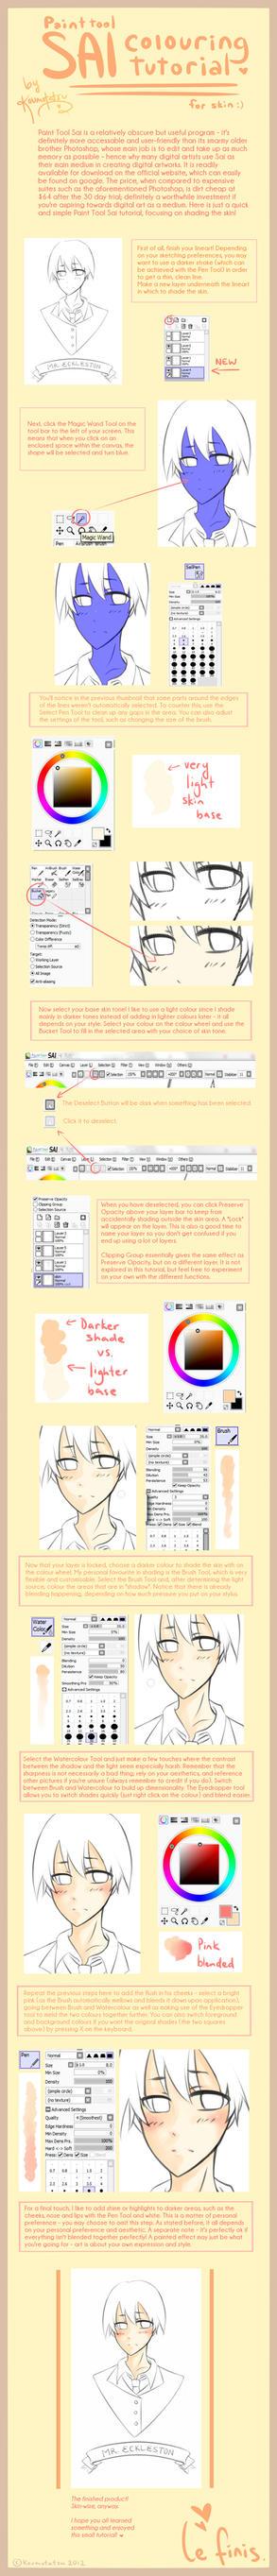 SAI: skin tutorial by koumotatsu